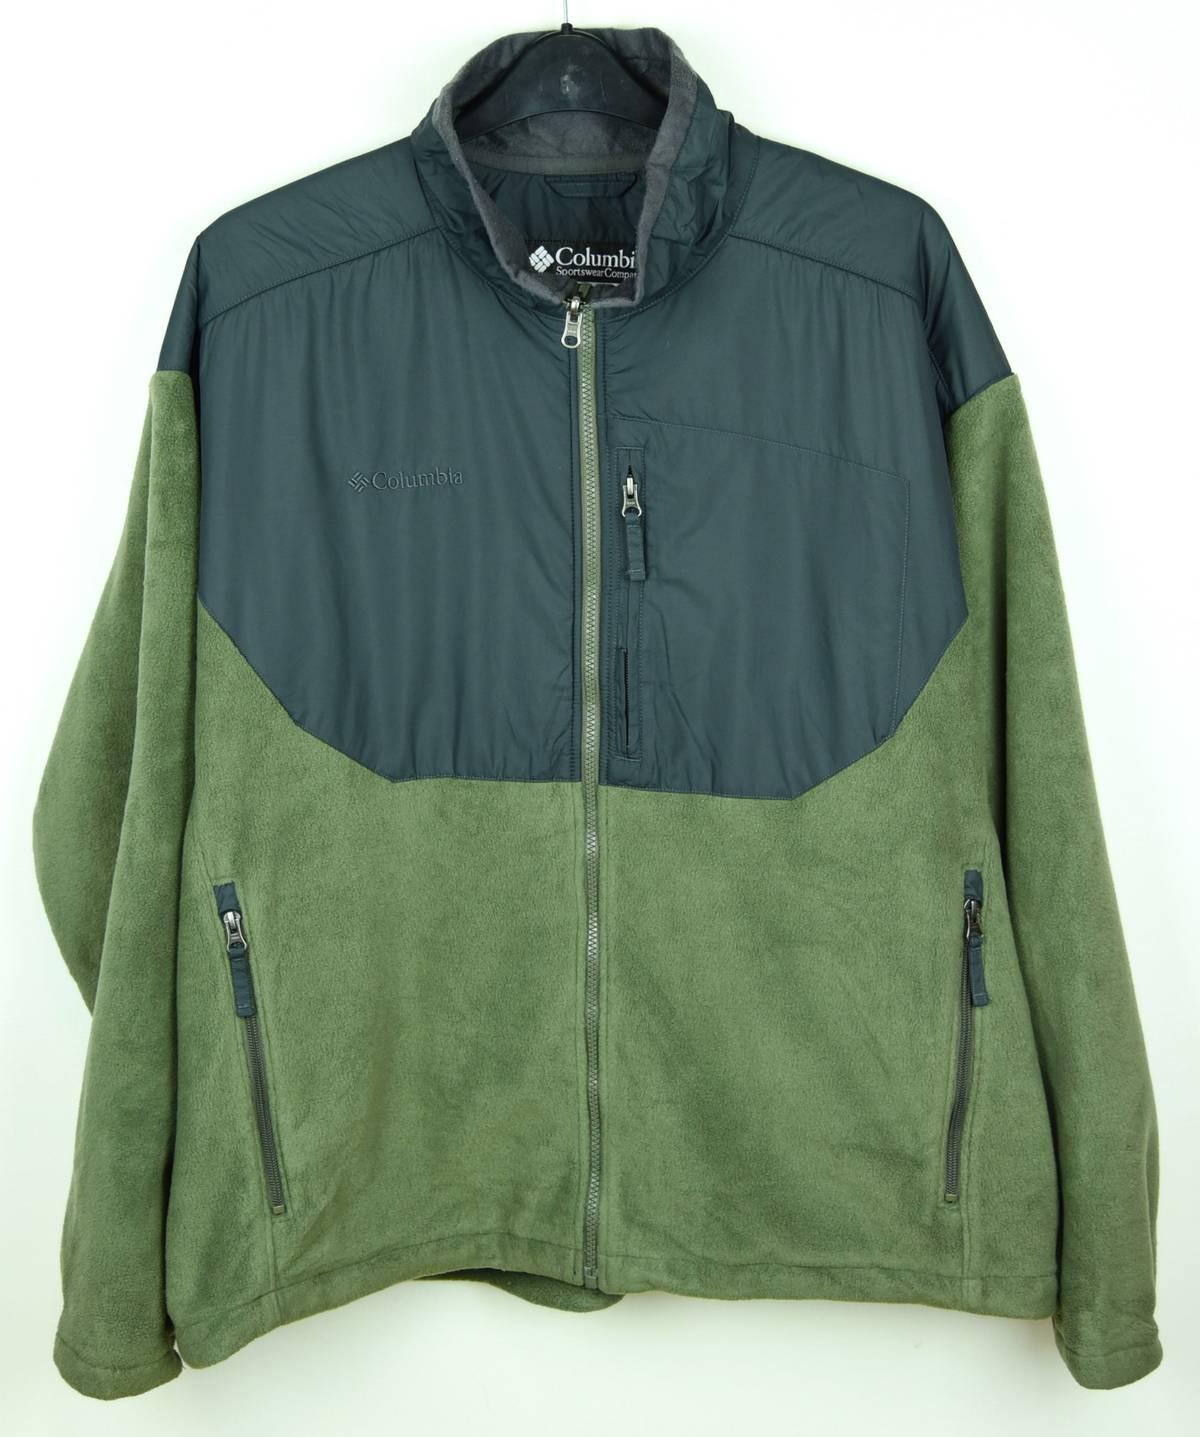 Columbia × Ski Columbia Core 2 Xl Fleece Mountable To Jacket Jumper Sweater Size Xxl $25